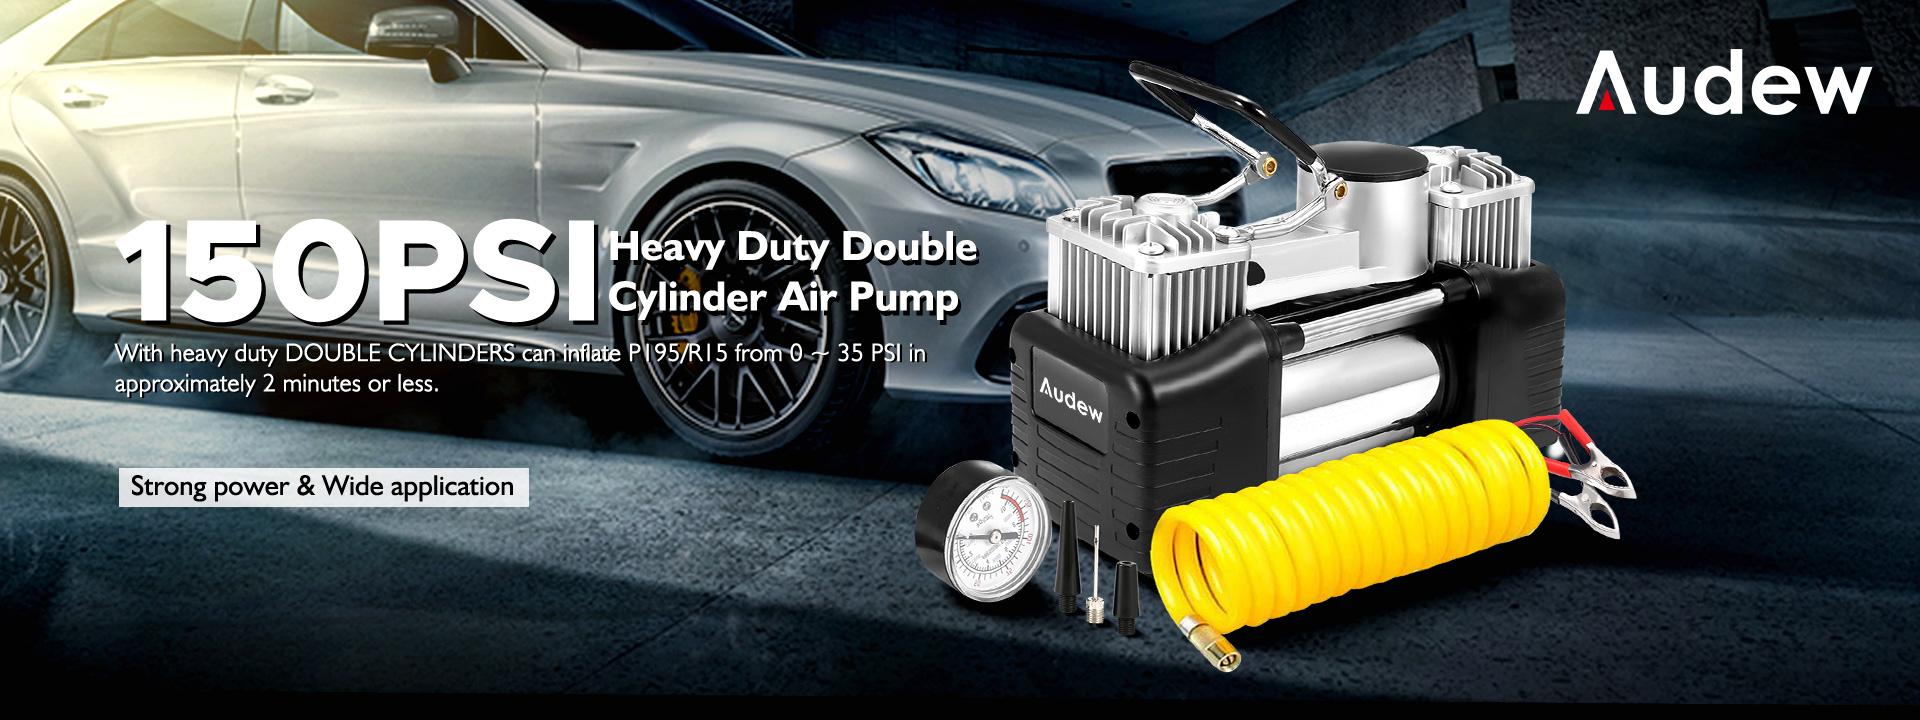 AUDEW 150PSI Heavy Duty Double Cylinder Air Pump